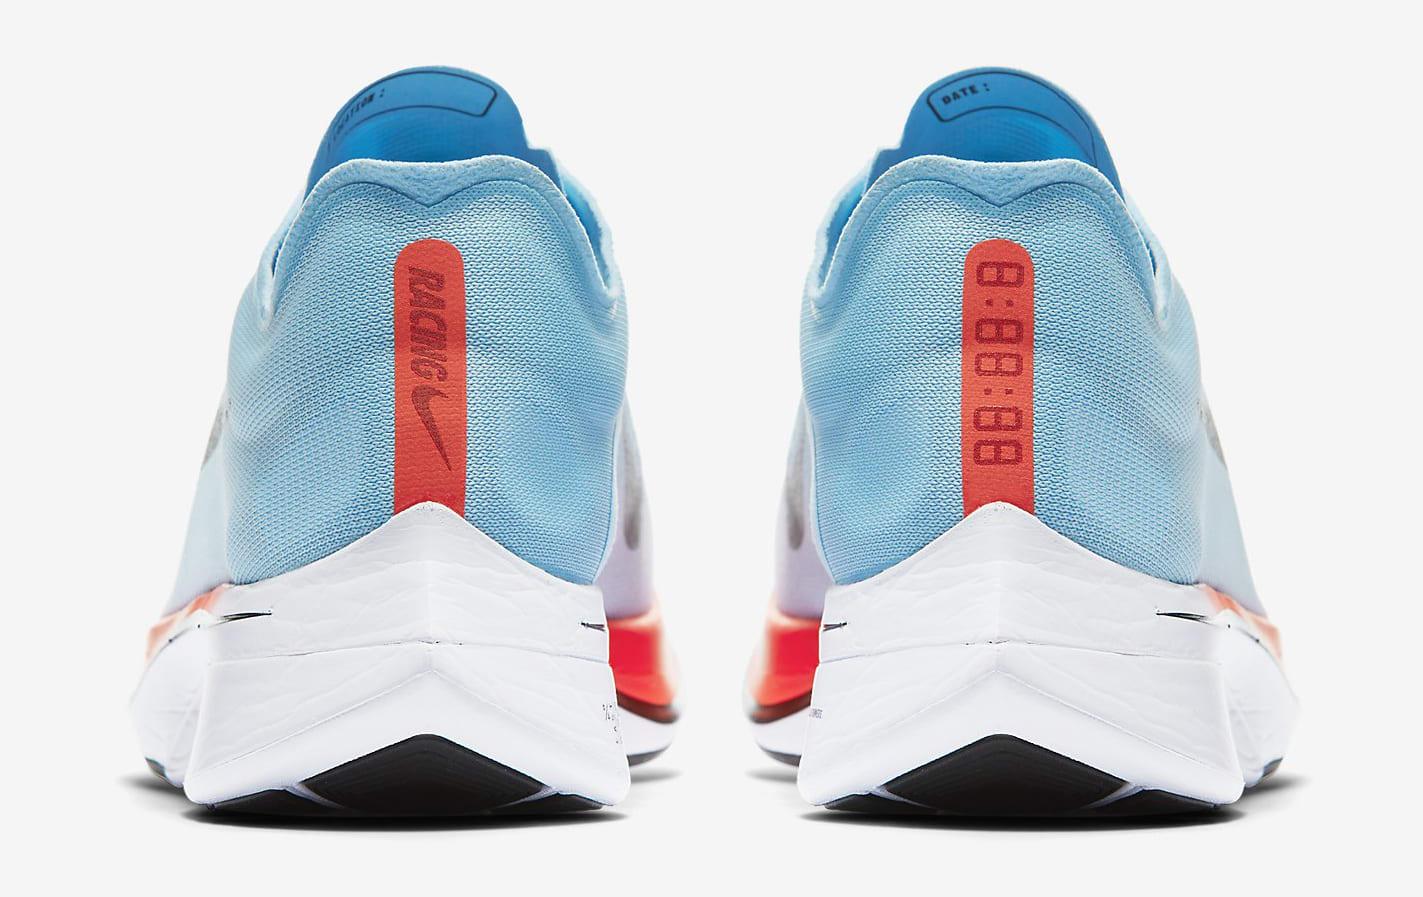 Nike Zoom Vaporfly 4 Percent 880847-401 Heel